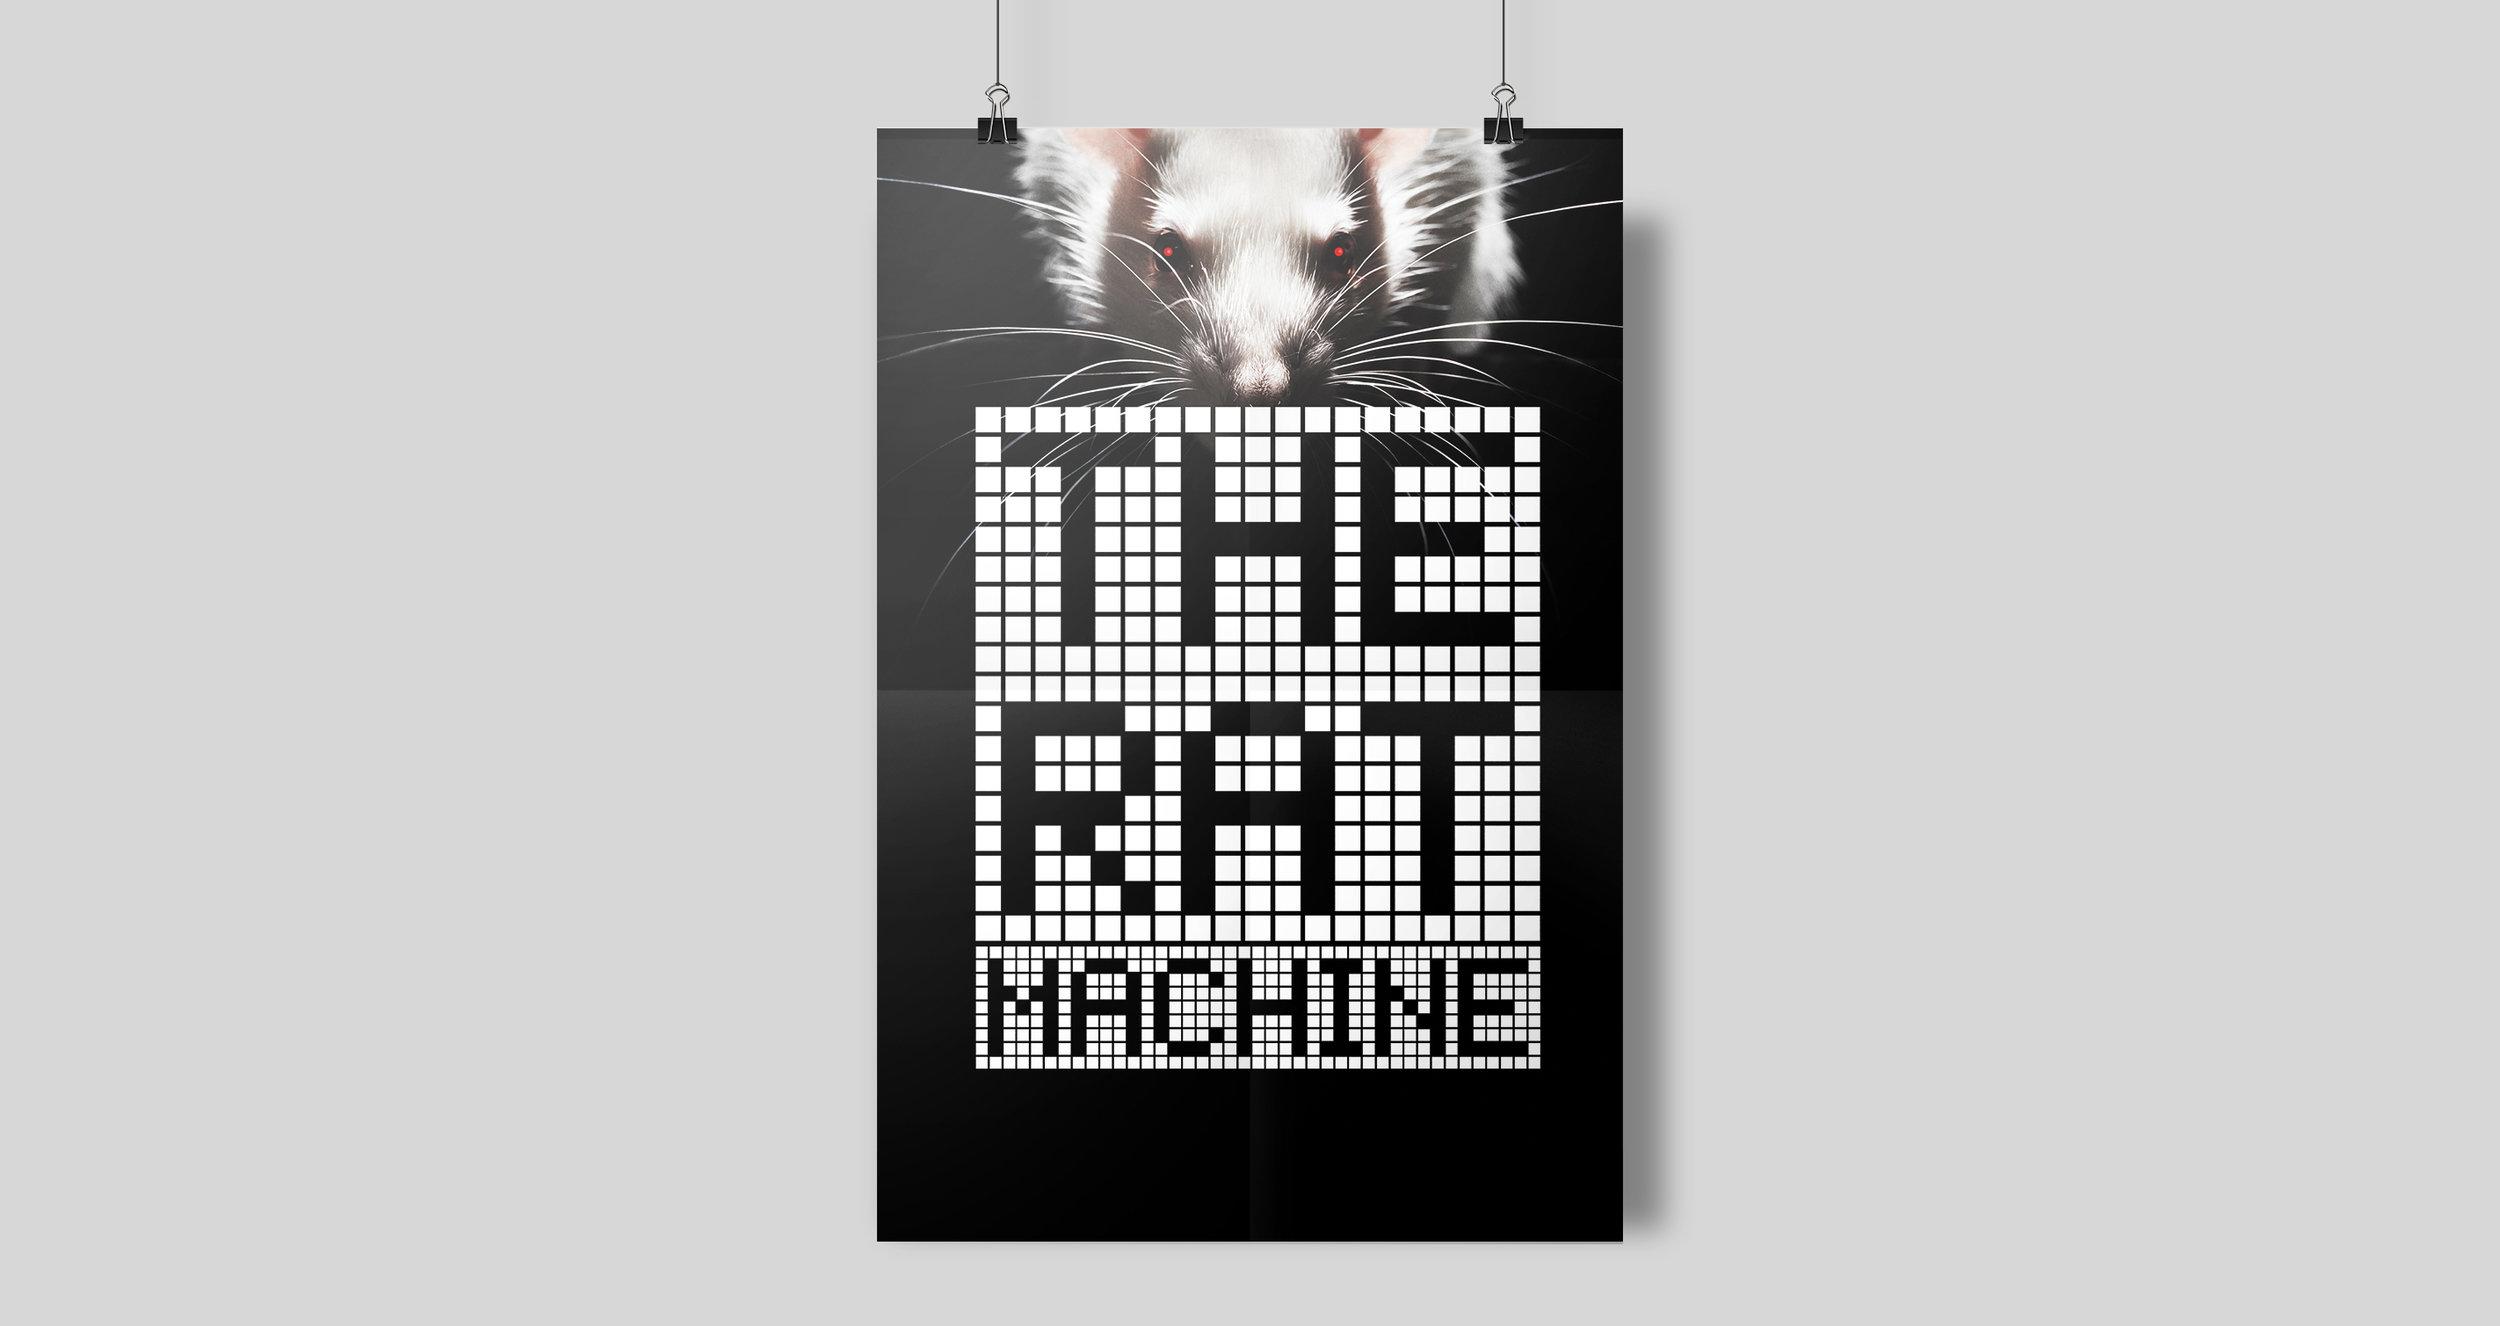 7.THE-RAT-MACHINE-insitu.jpg